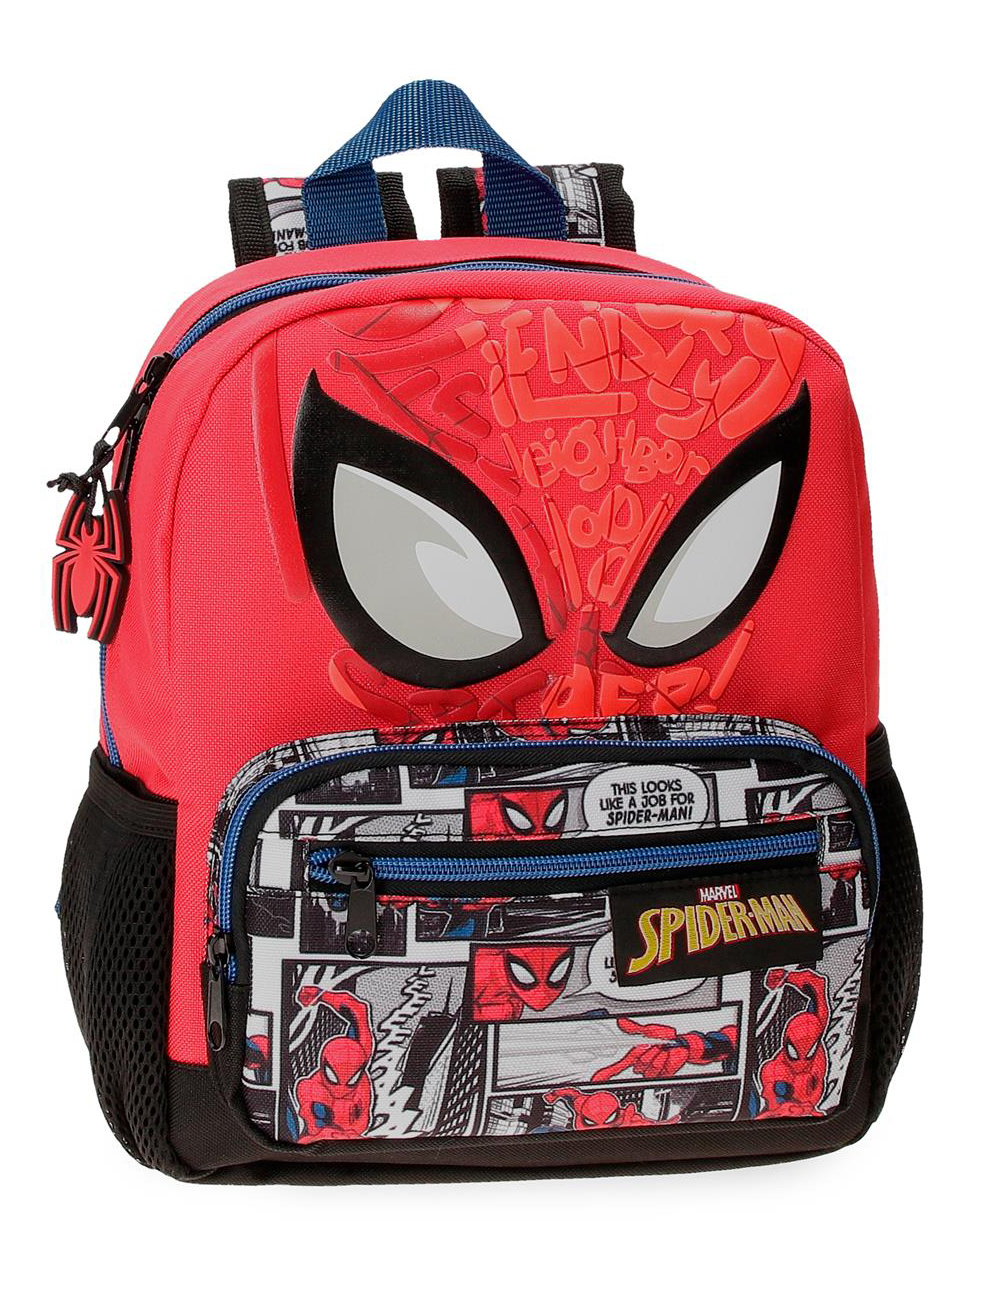 2252121 Mochila 28cm Spiderman Comic